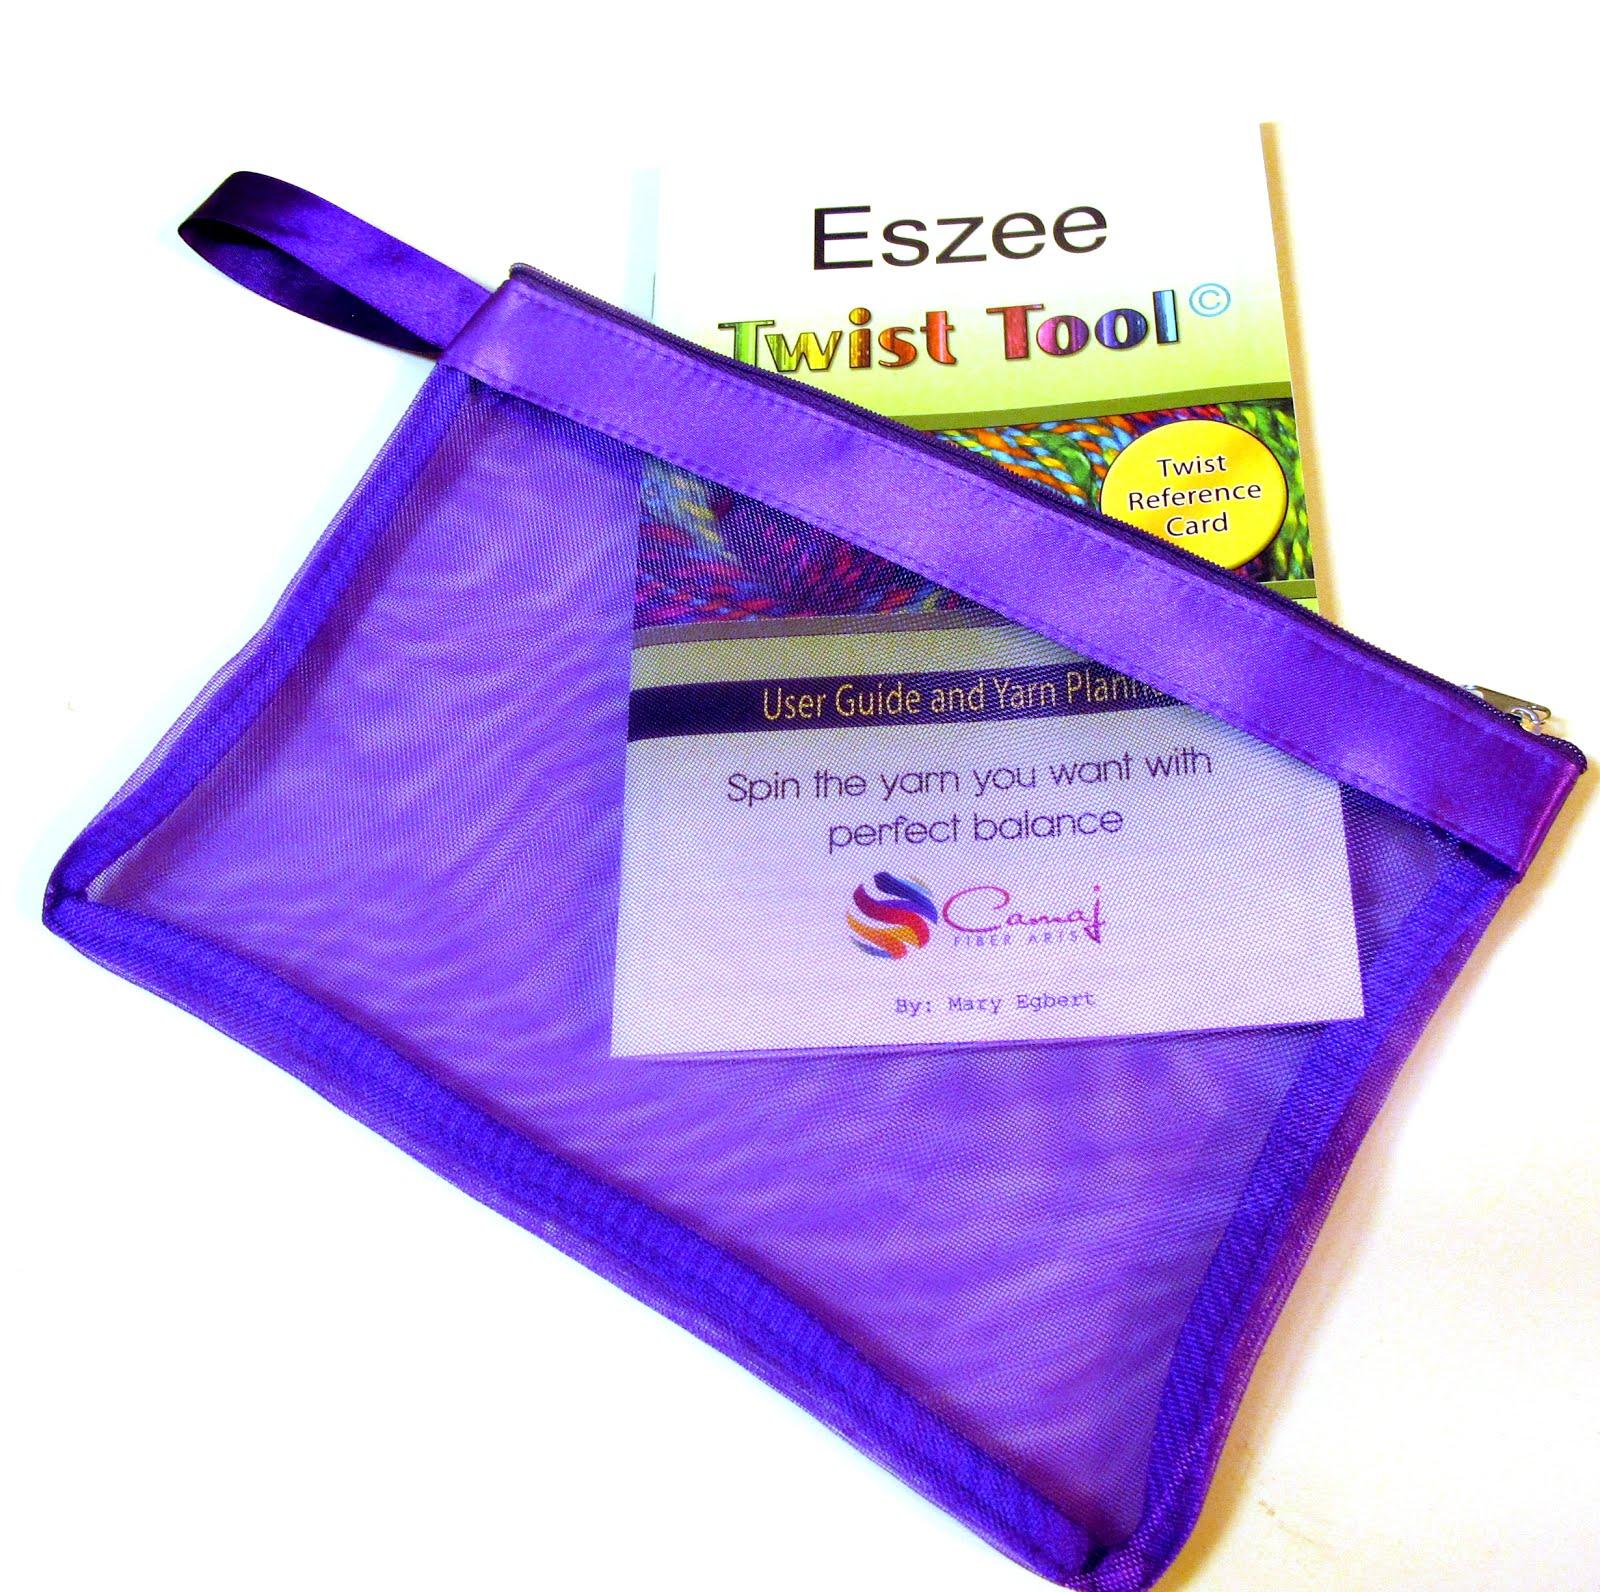 Eszee Twist Tool and Yarn Planner